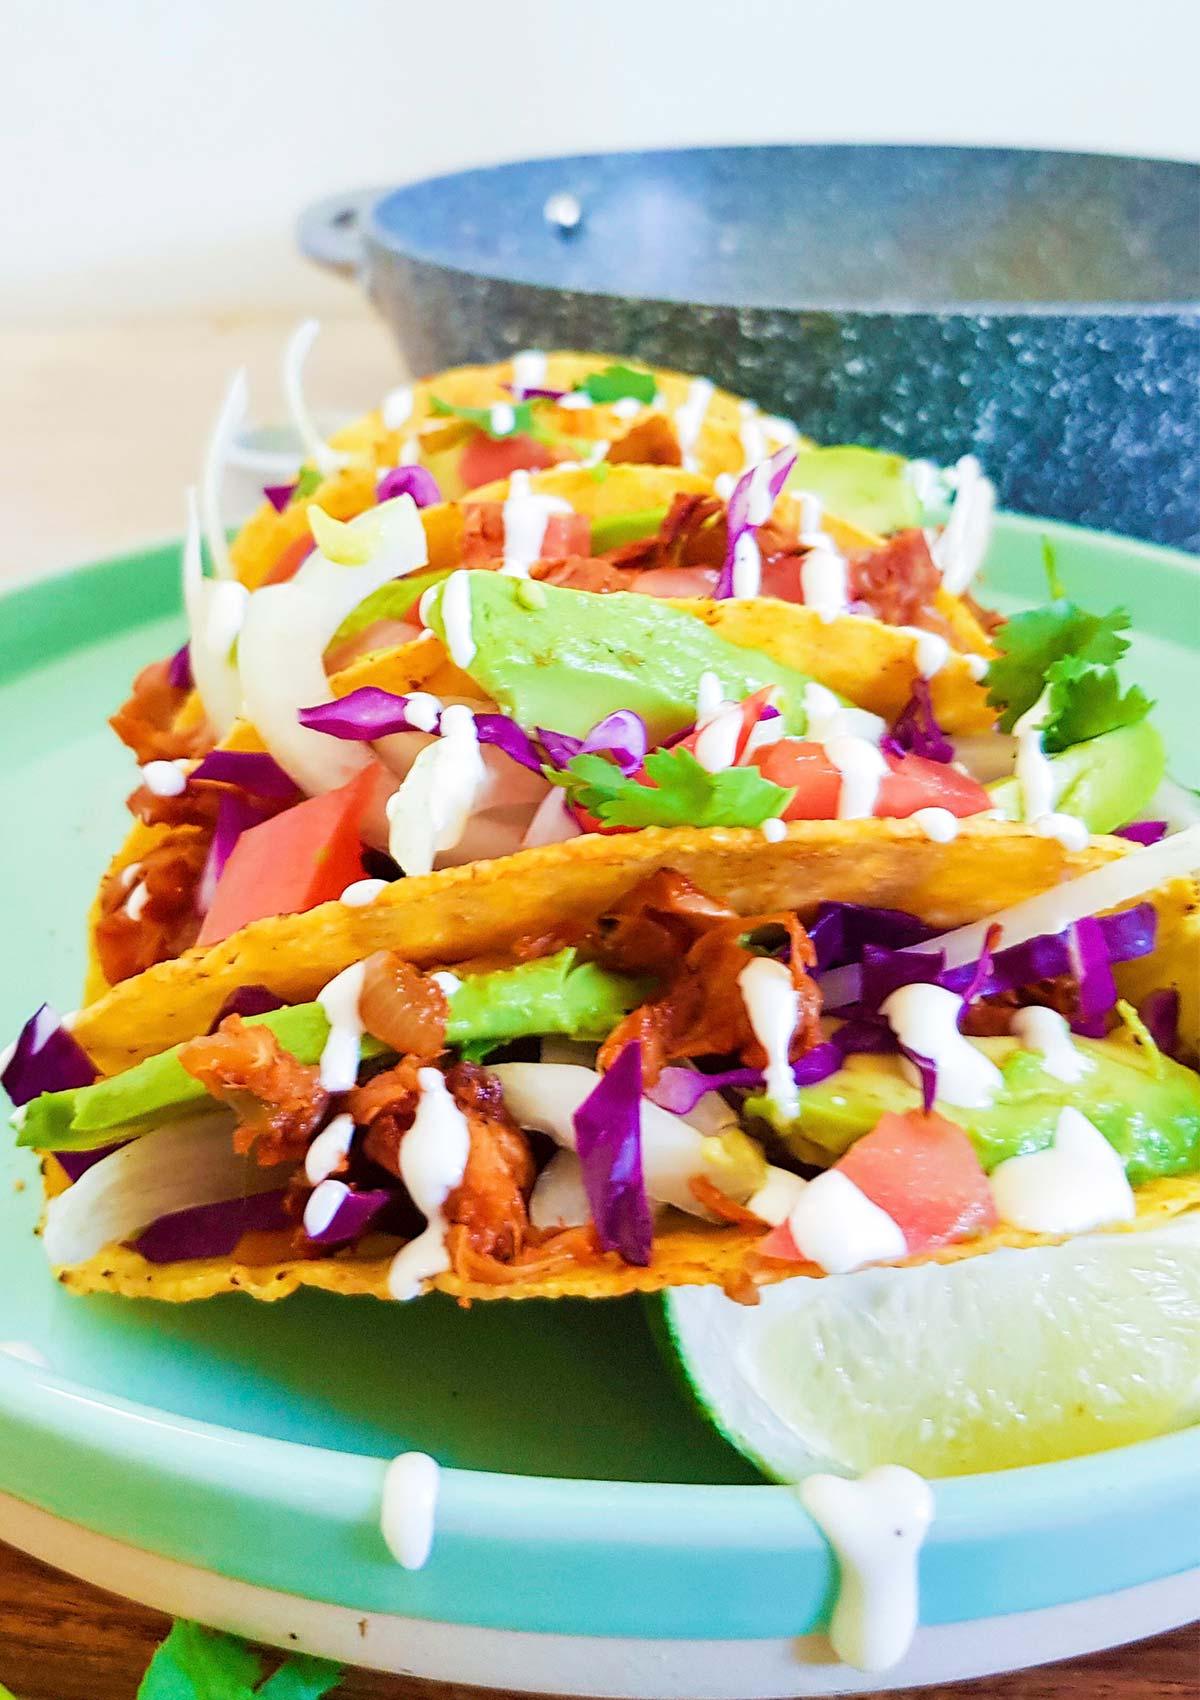 Jackfruit tacos topped with vegan sour cream